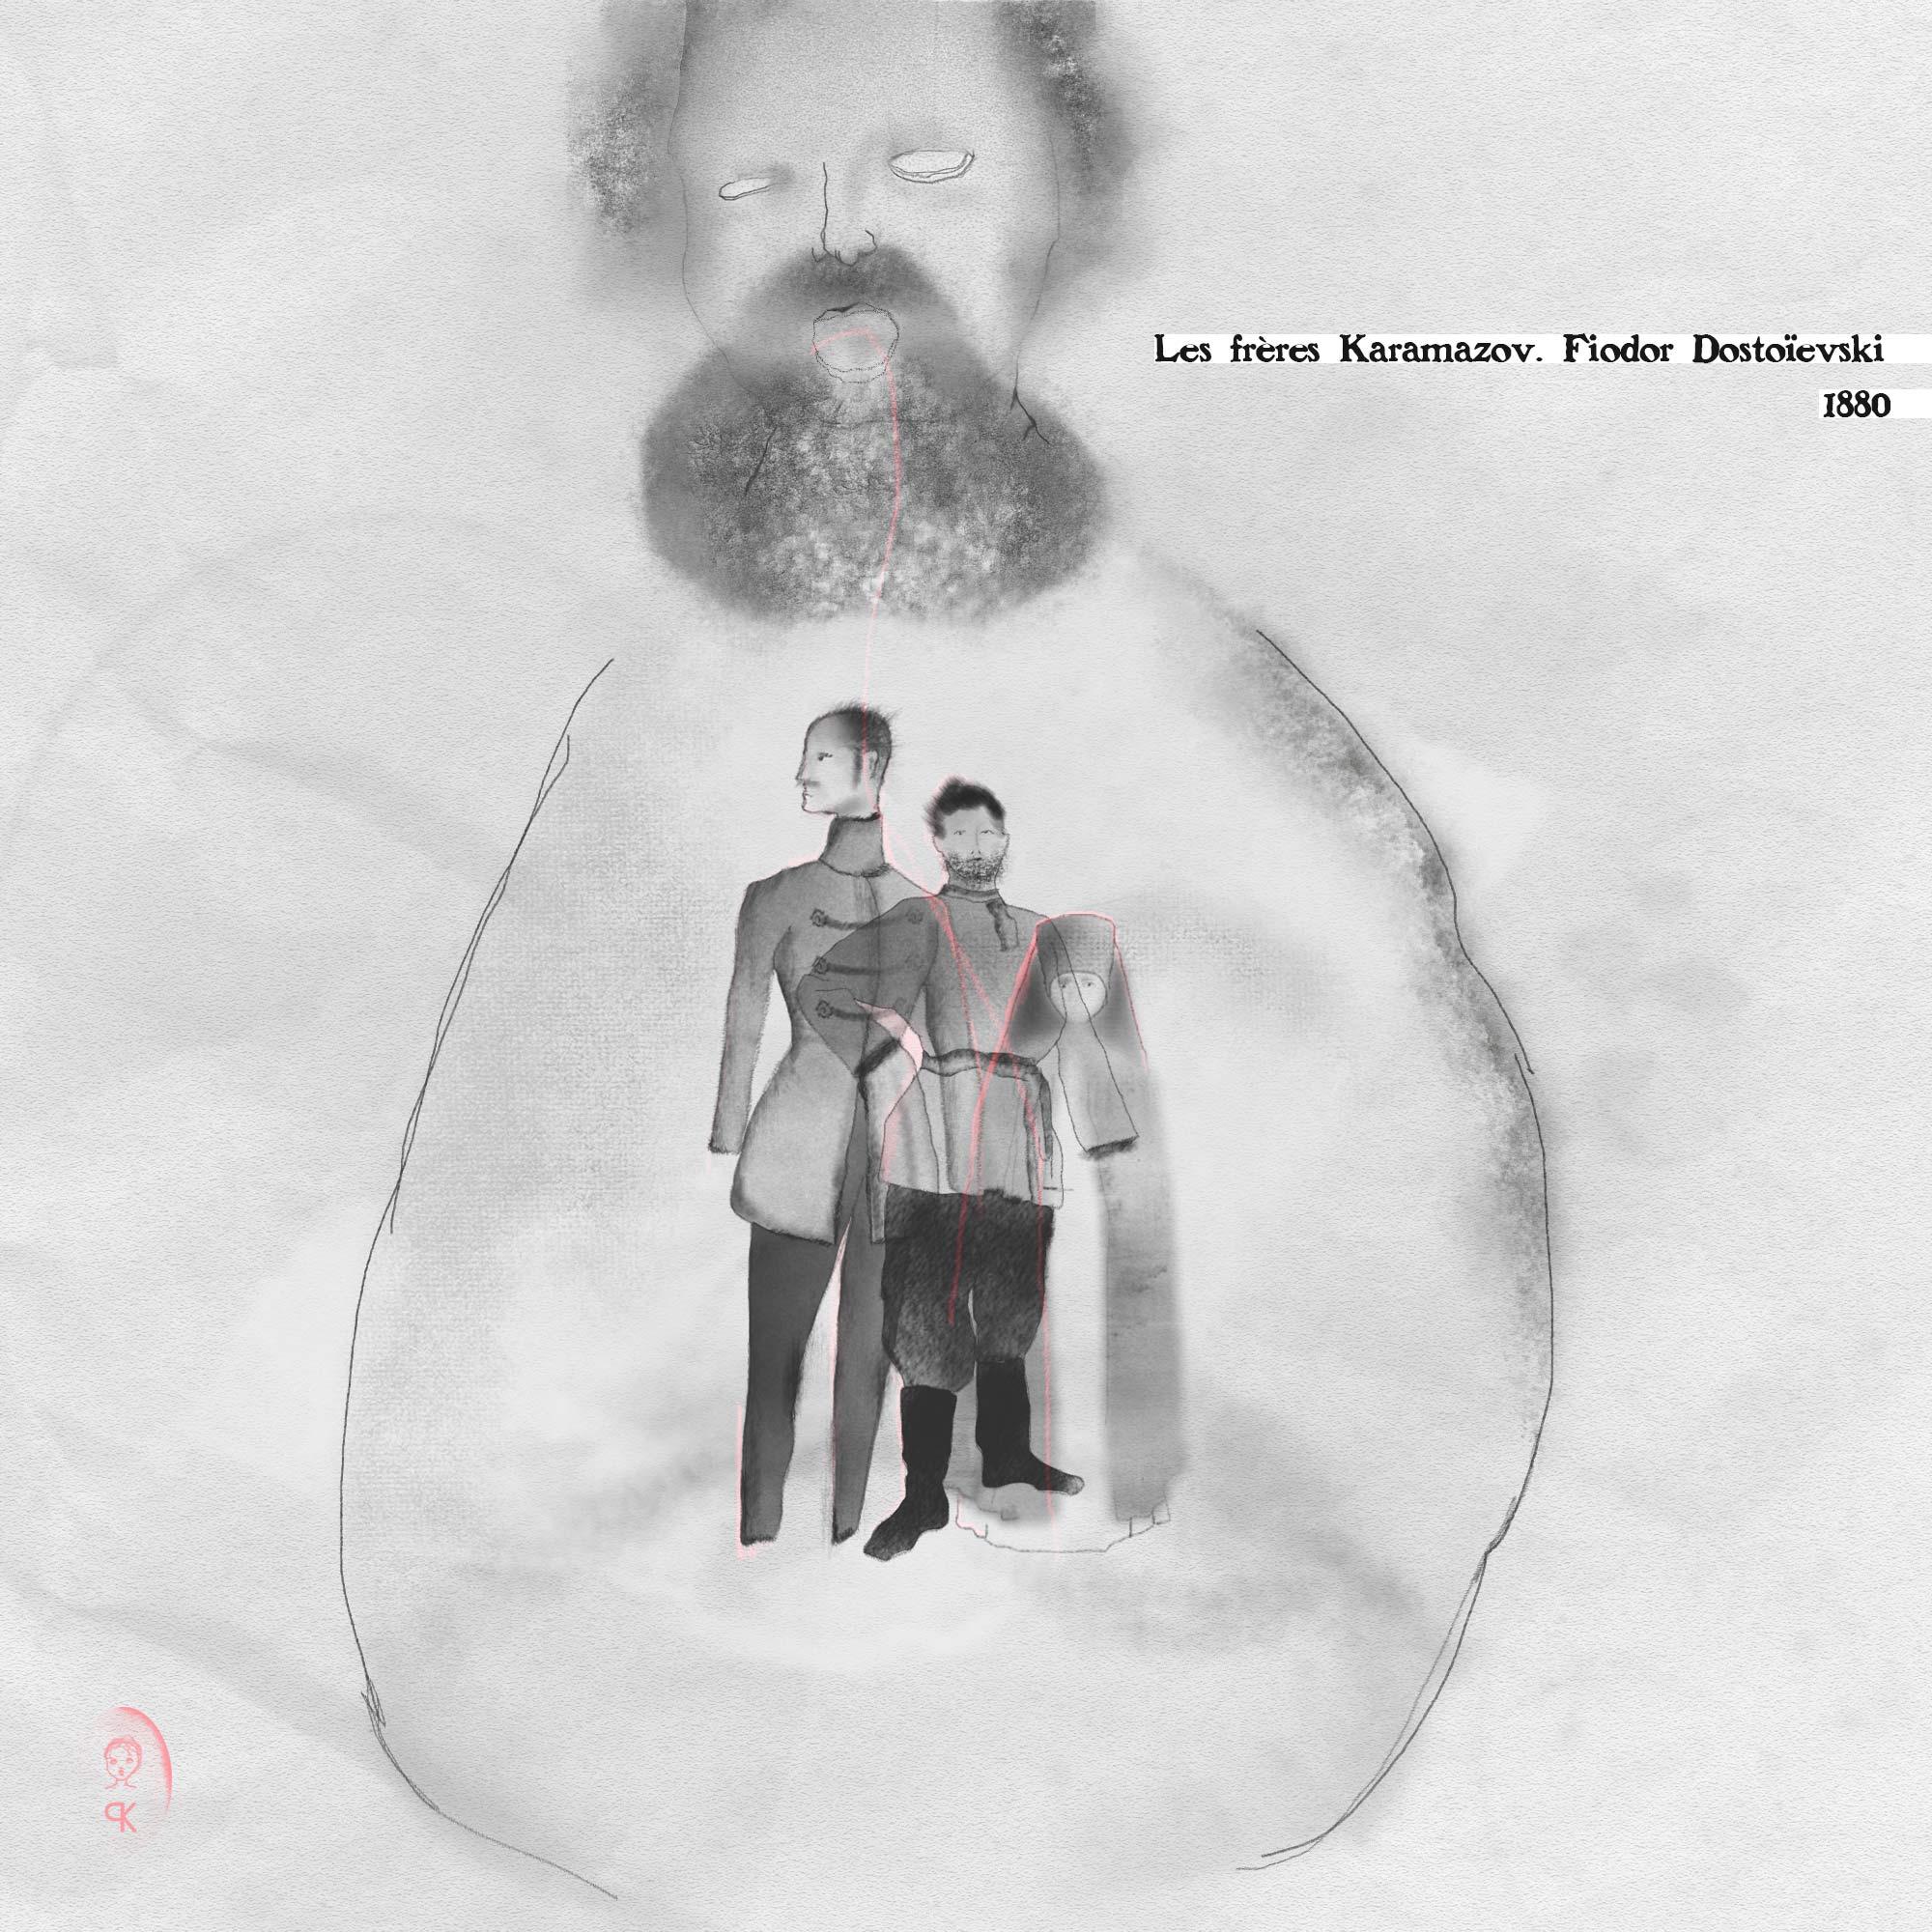 Les frères Karamazov, mai 2020